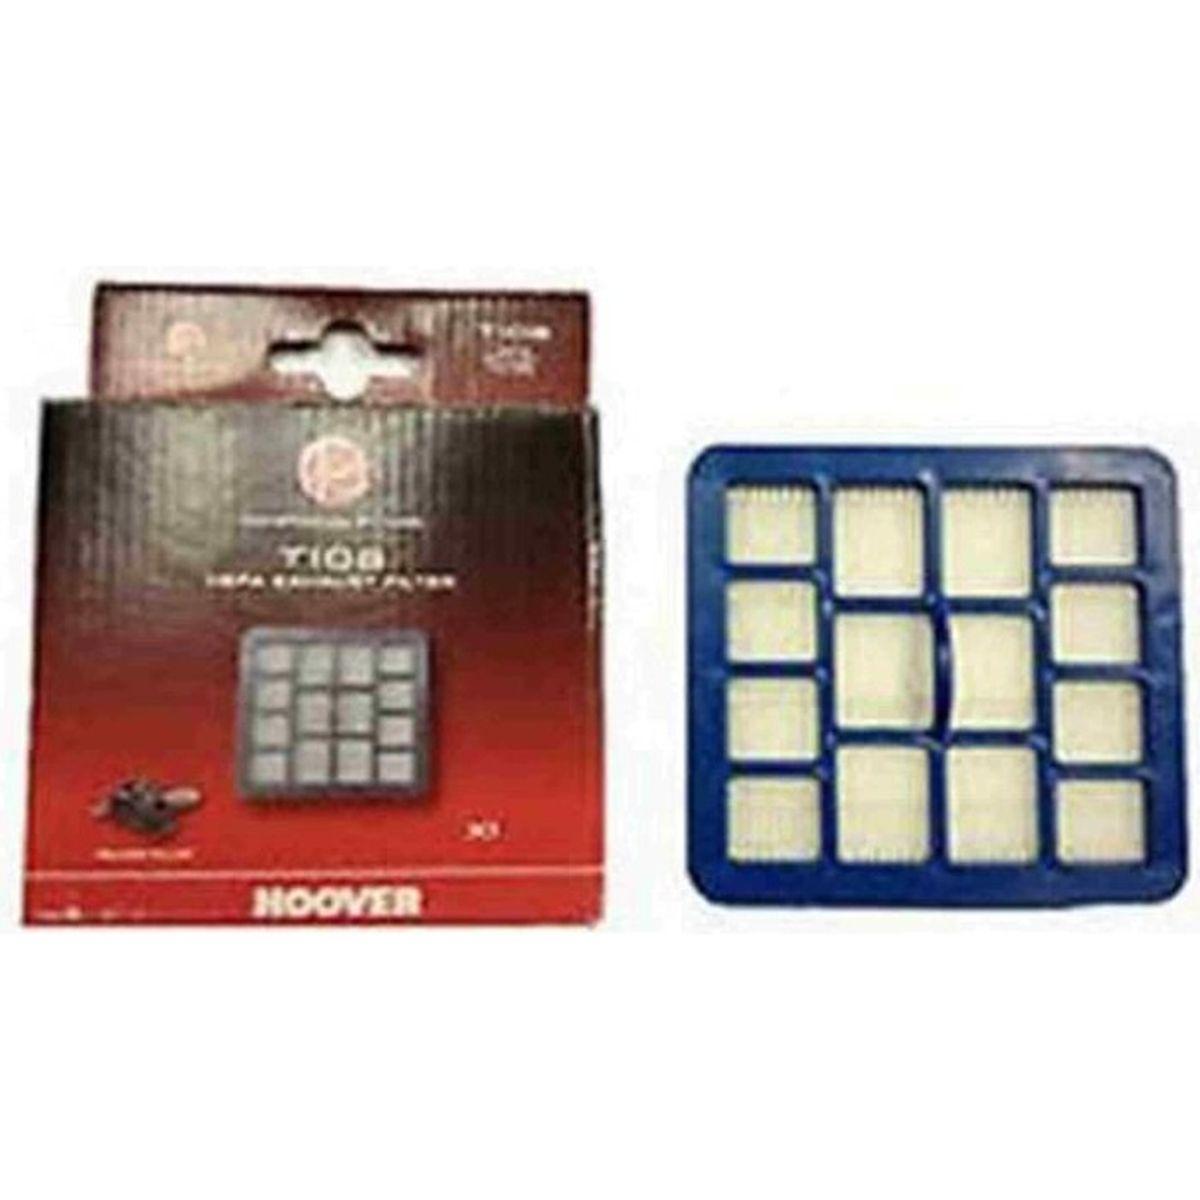 Aspirateur SET HEPA-Filtre pour Hoover tc4266 011 tc4266 021 ts2076 011